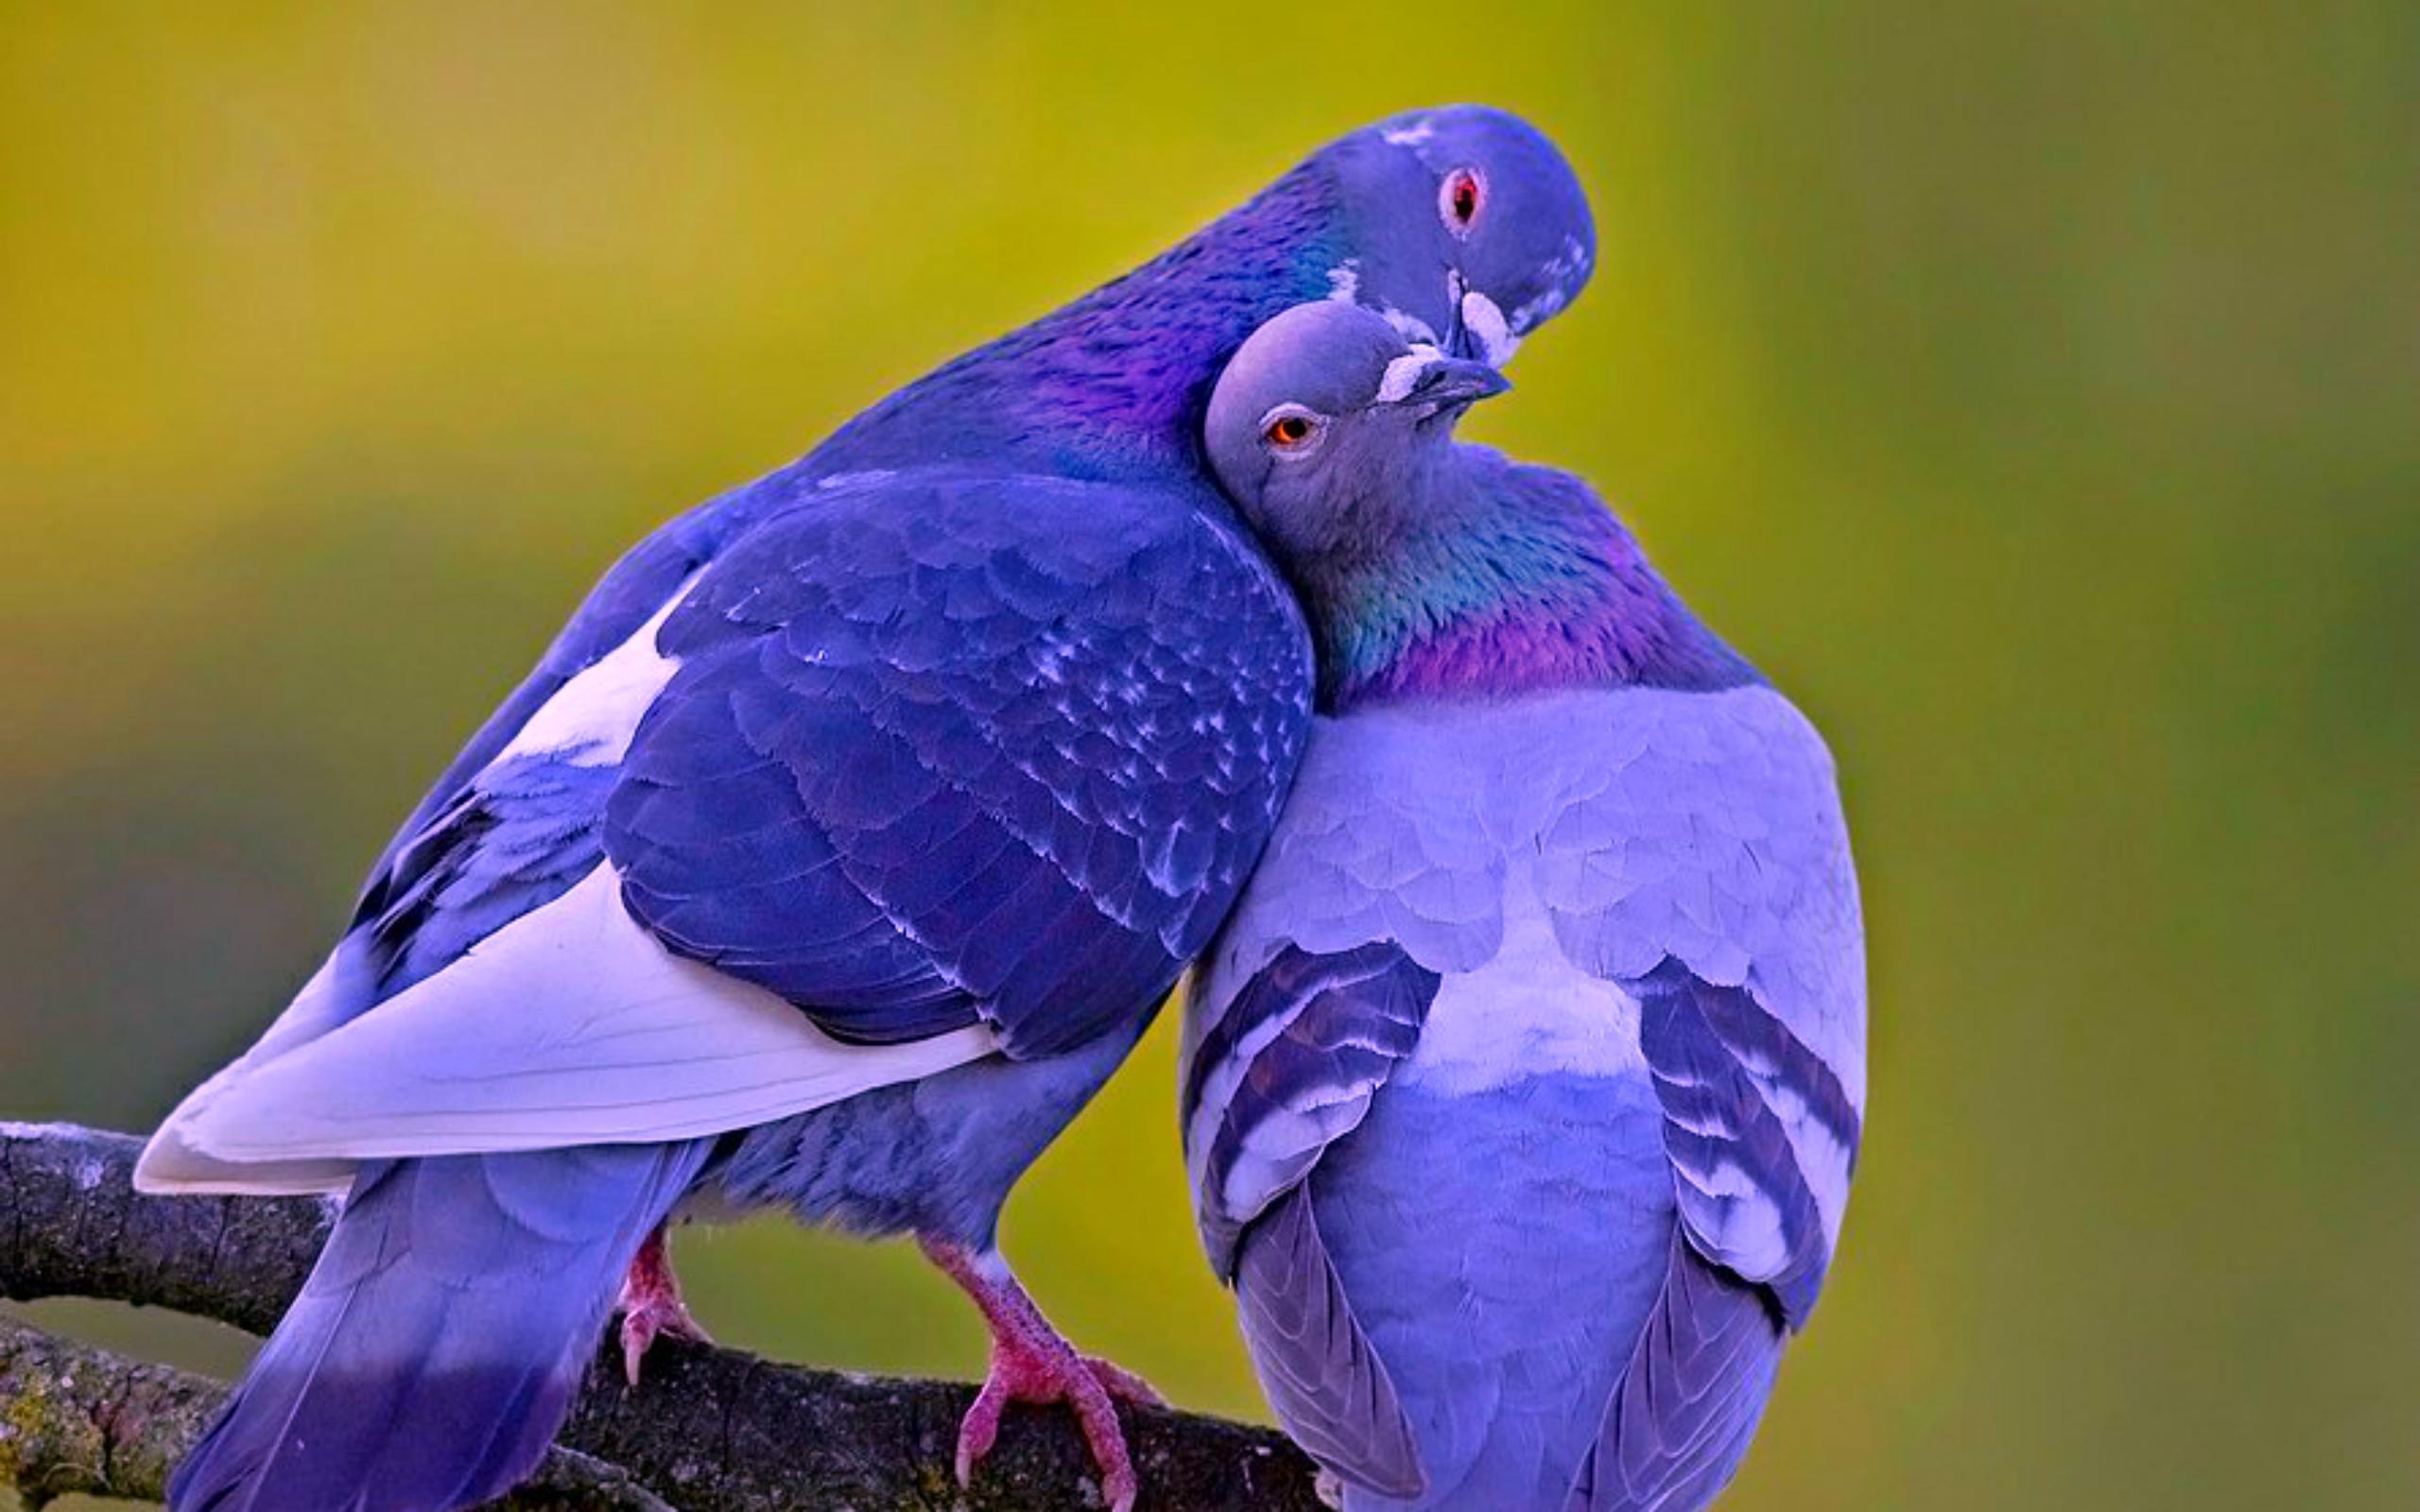 Beautiful Love Birds 2560x1600 Download Hd Wallpaper Wallpapertip